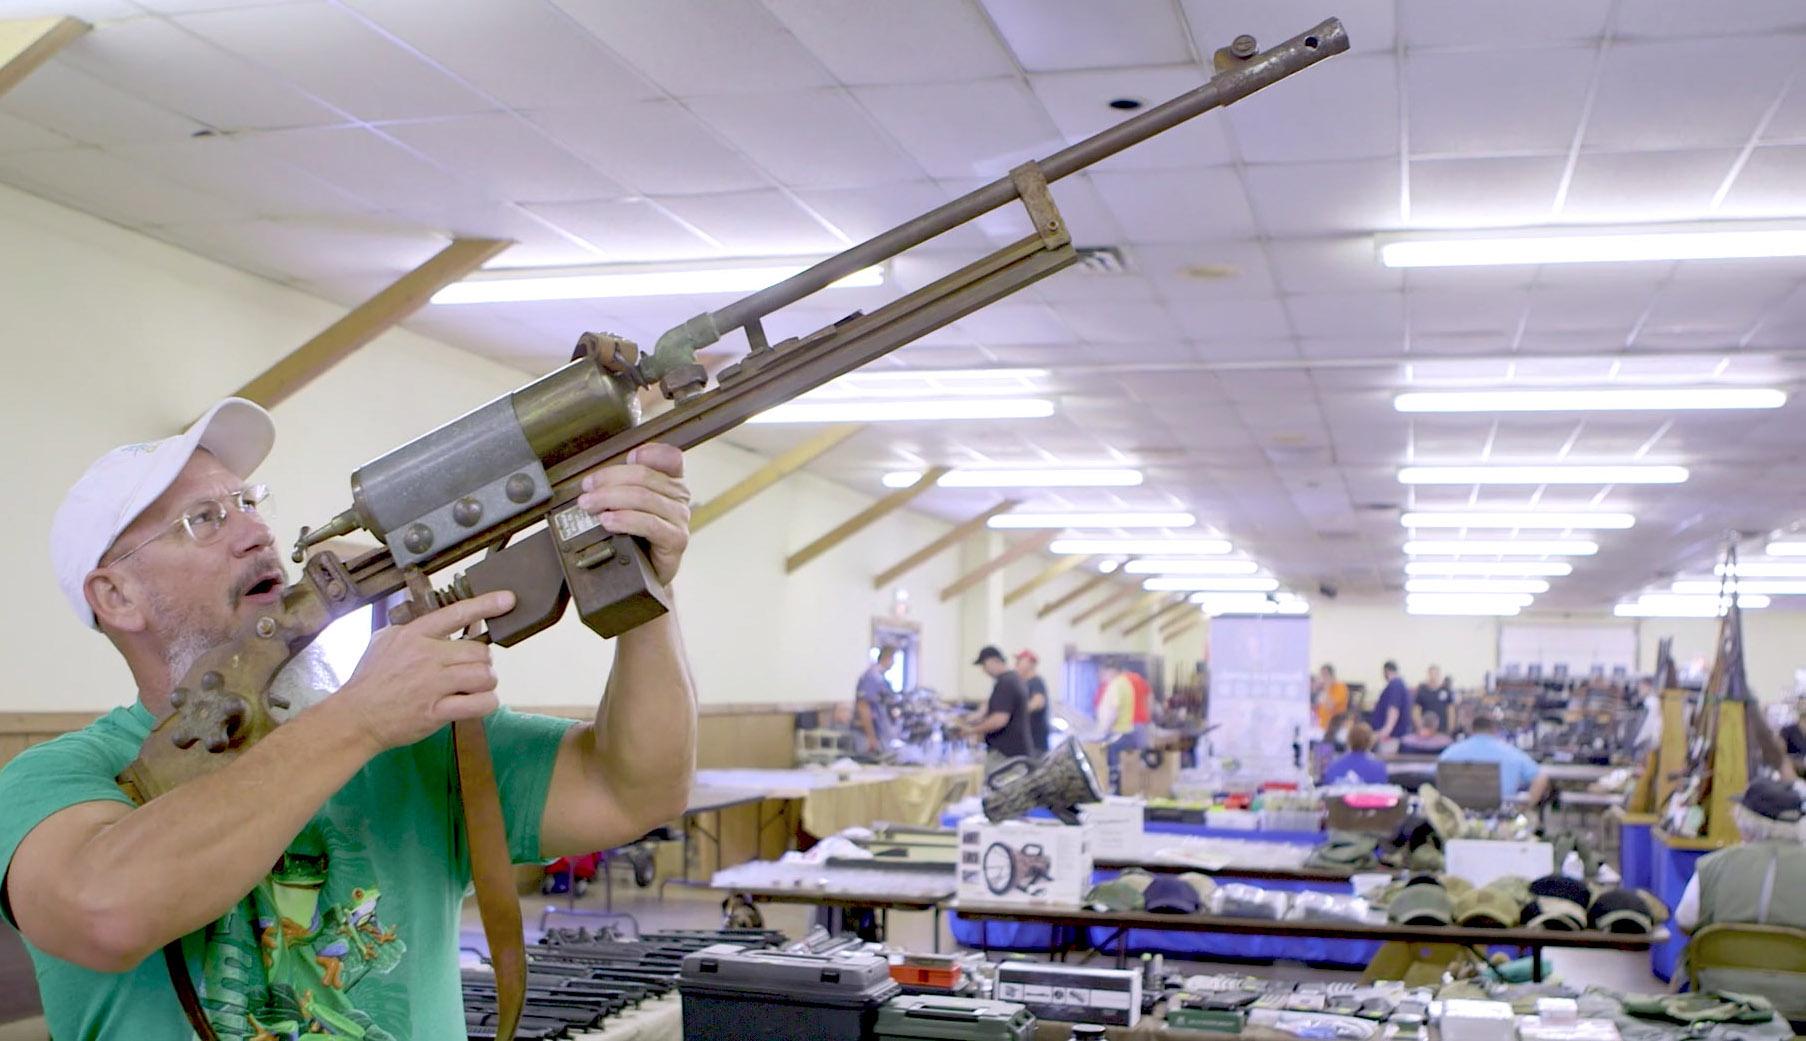 gun show guy aiming up.jpg